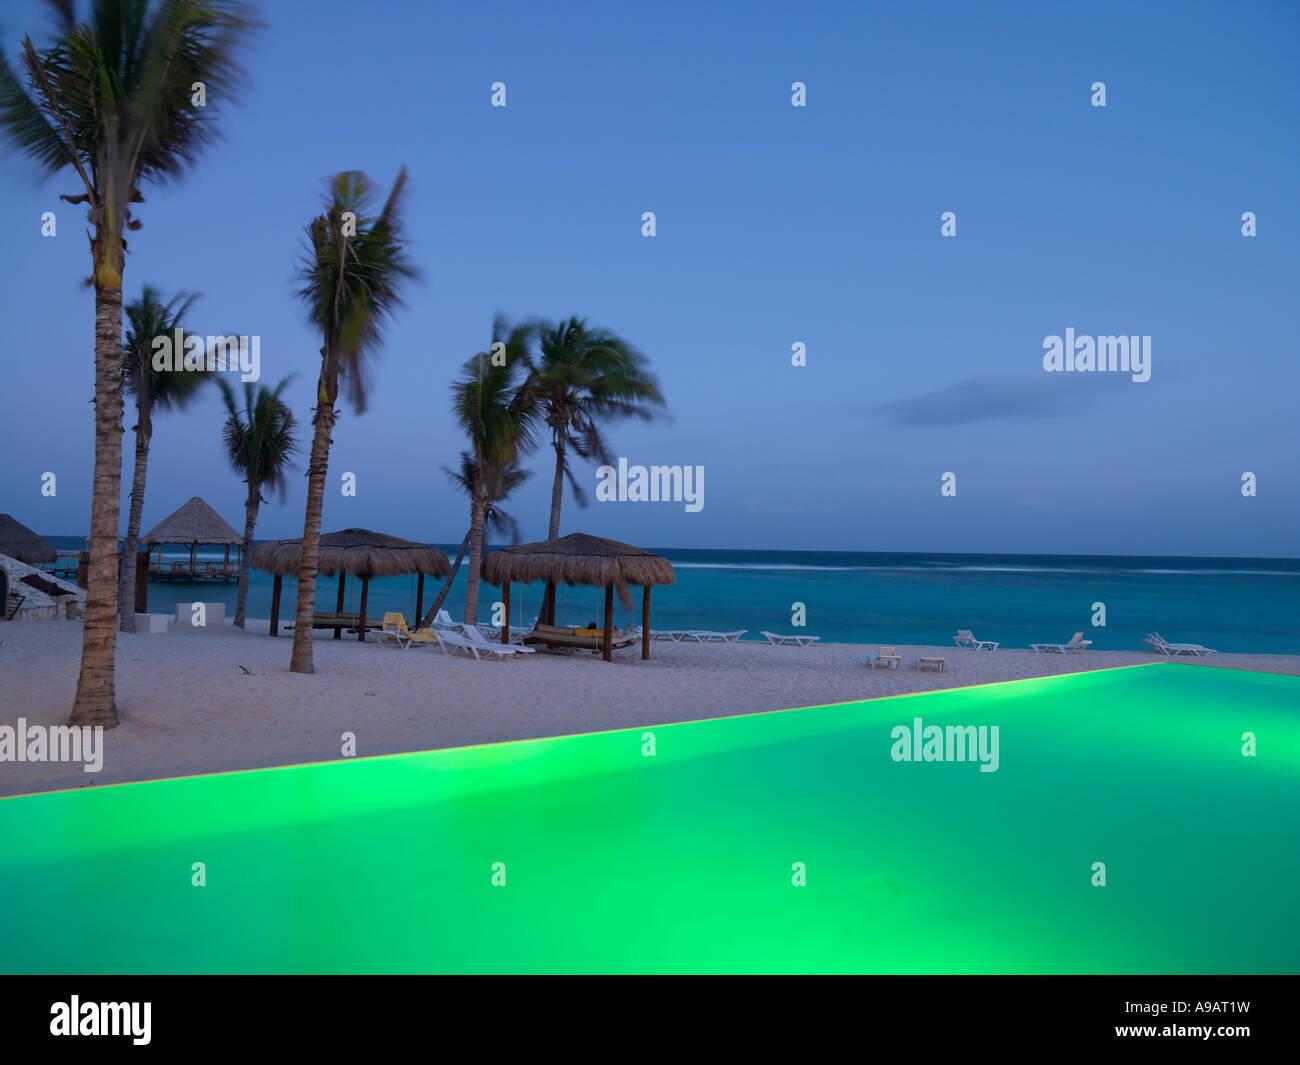 Mexico Quintana Roo Yucatan Peninsula Akumal Mayan Riviera infinity pool illuminated by the edge of a beach with - Stock Image